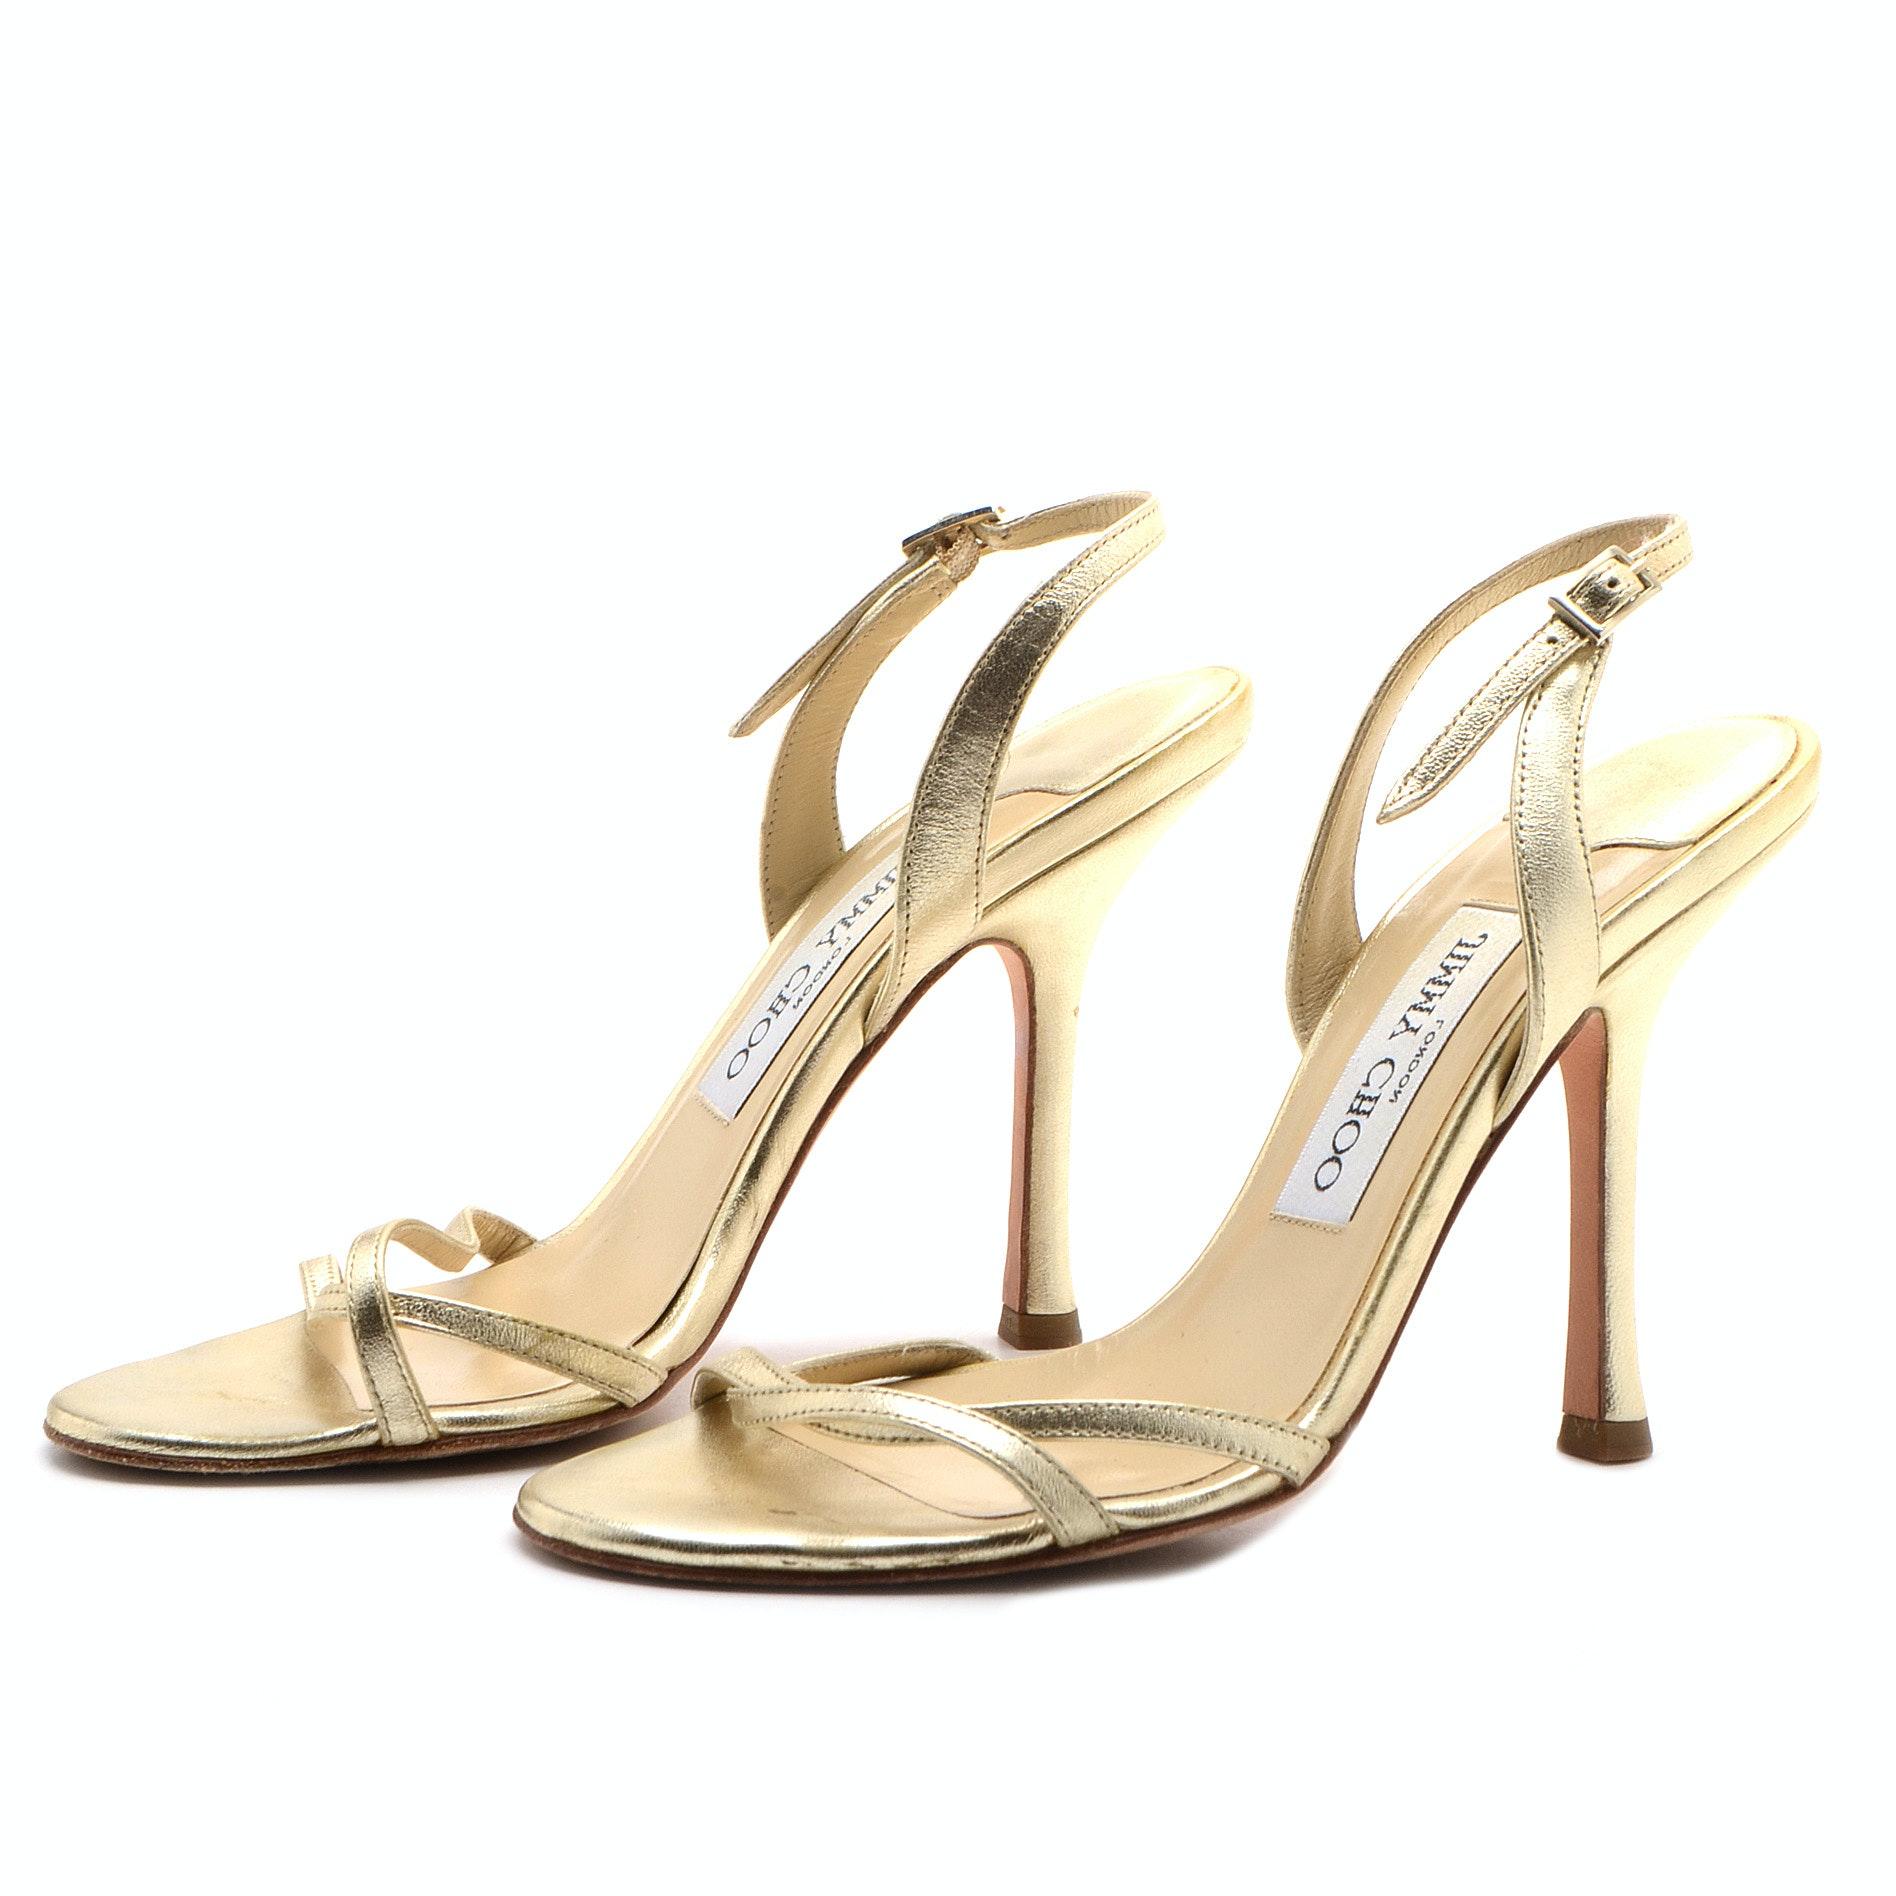 Jimmy Choo of London Gold Metallic Slingback Dress Sandals